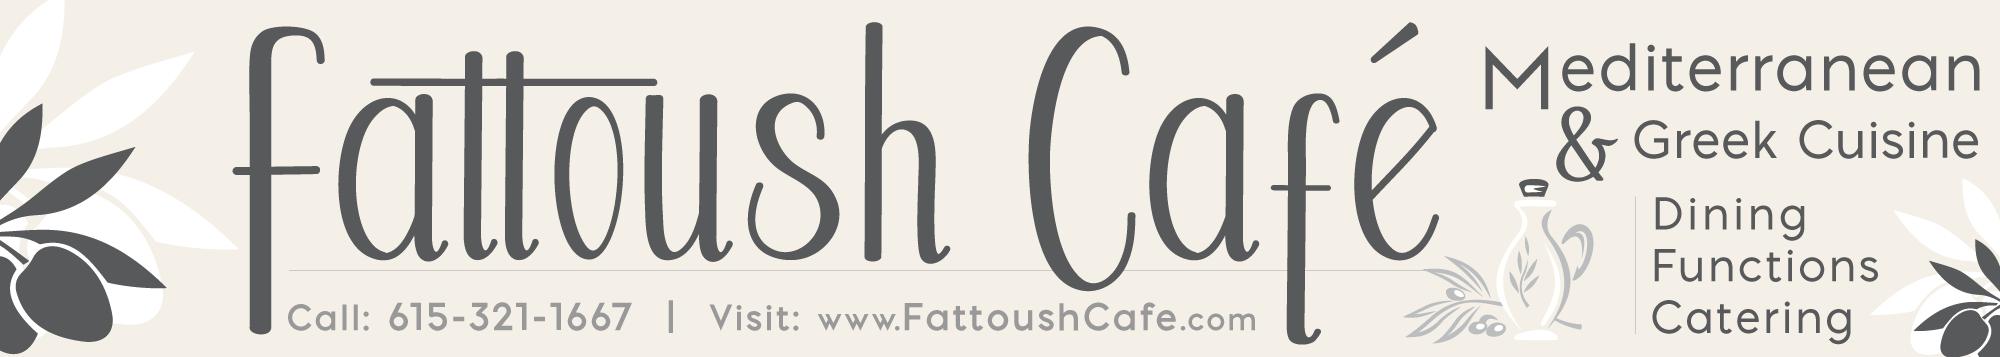 Fattoush-Cafe_1-Website-Front.png